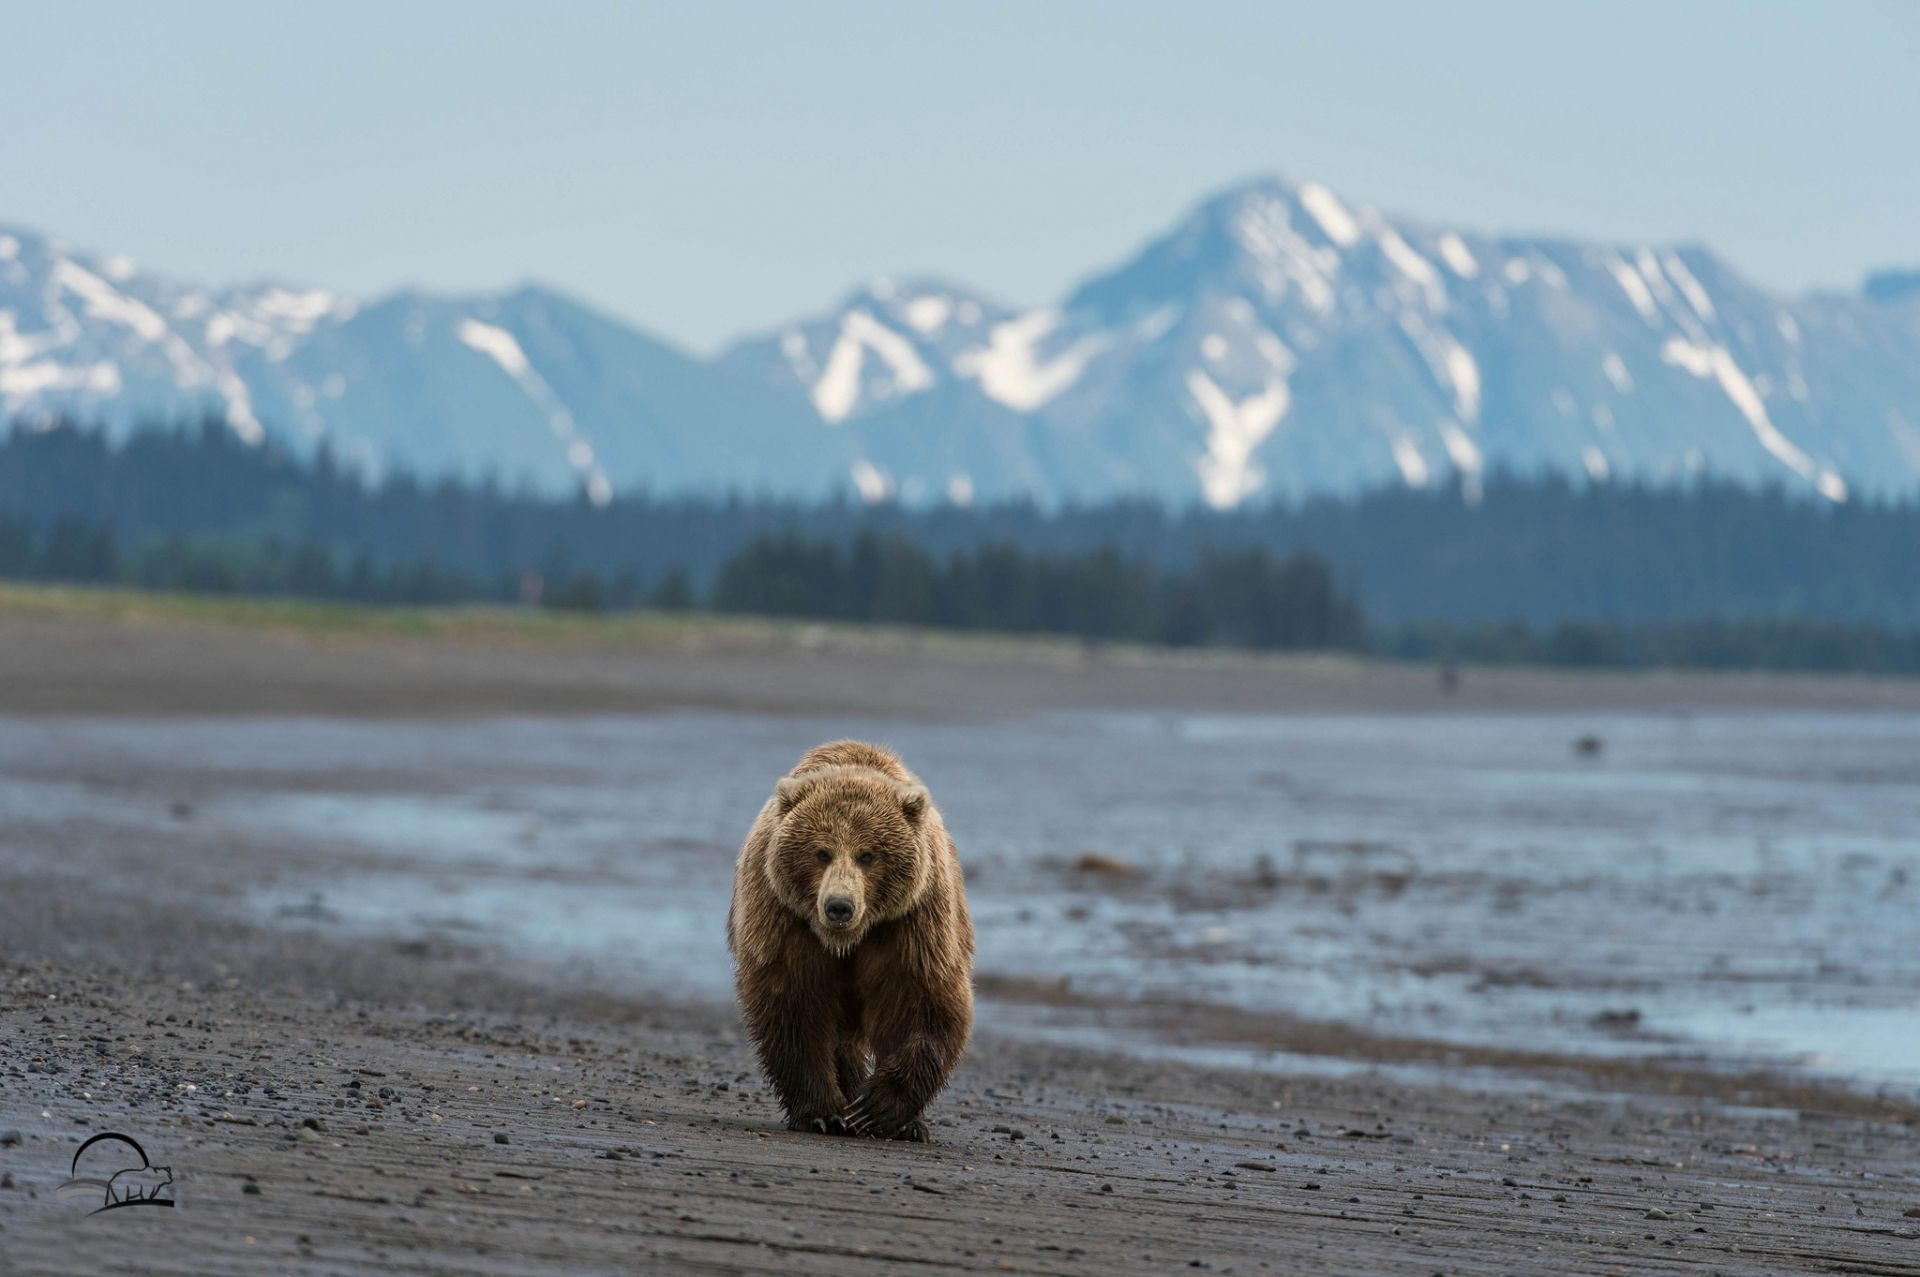 Alaskan Brown Bear Silhouetted Against Mount Katolinat, Alaska скачать